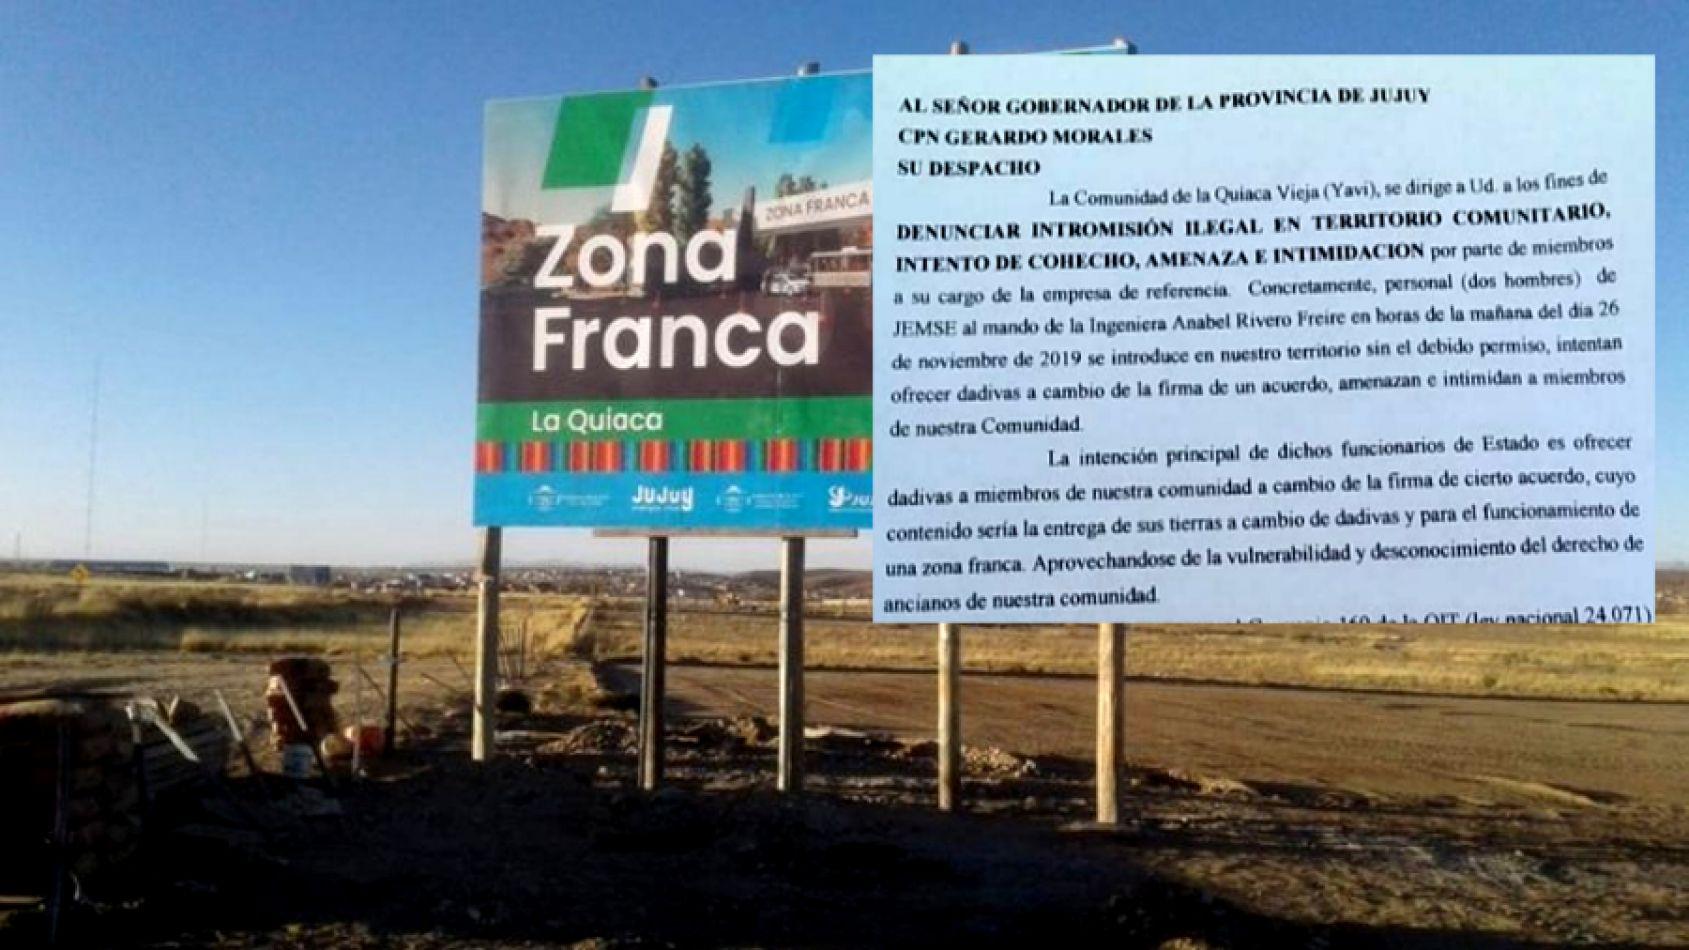 Denuncian que funcionarios de Morales realizan aprietes a la comunidad de La Quiaca Vieja